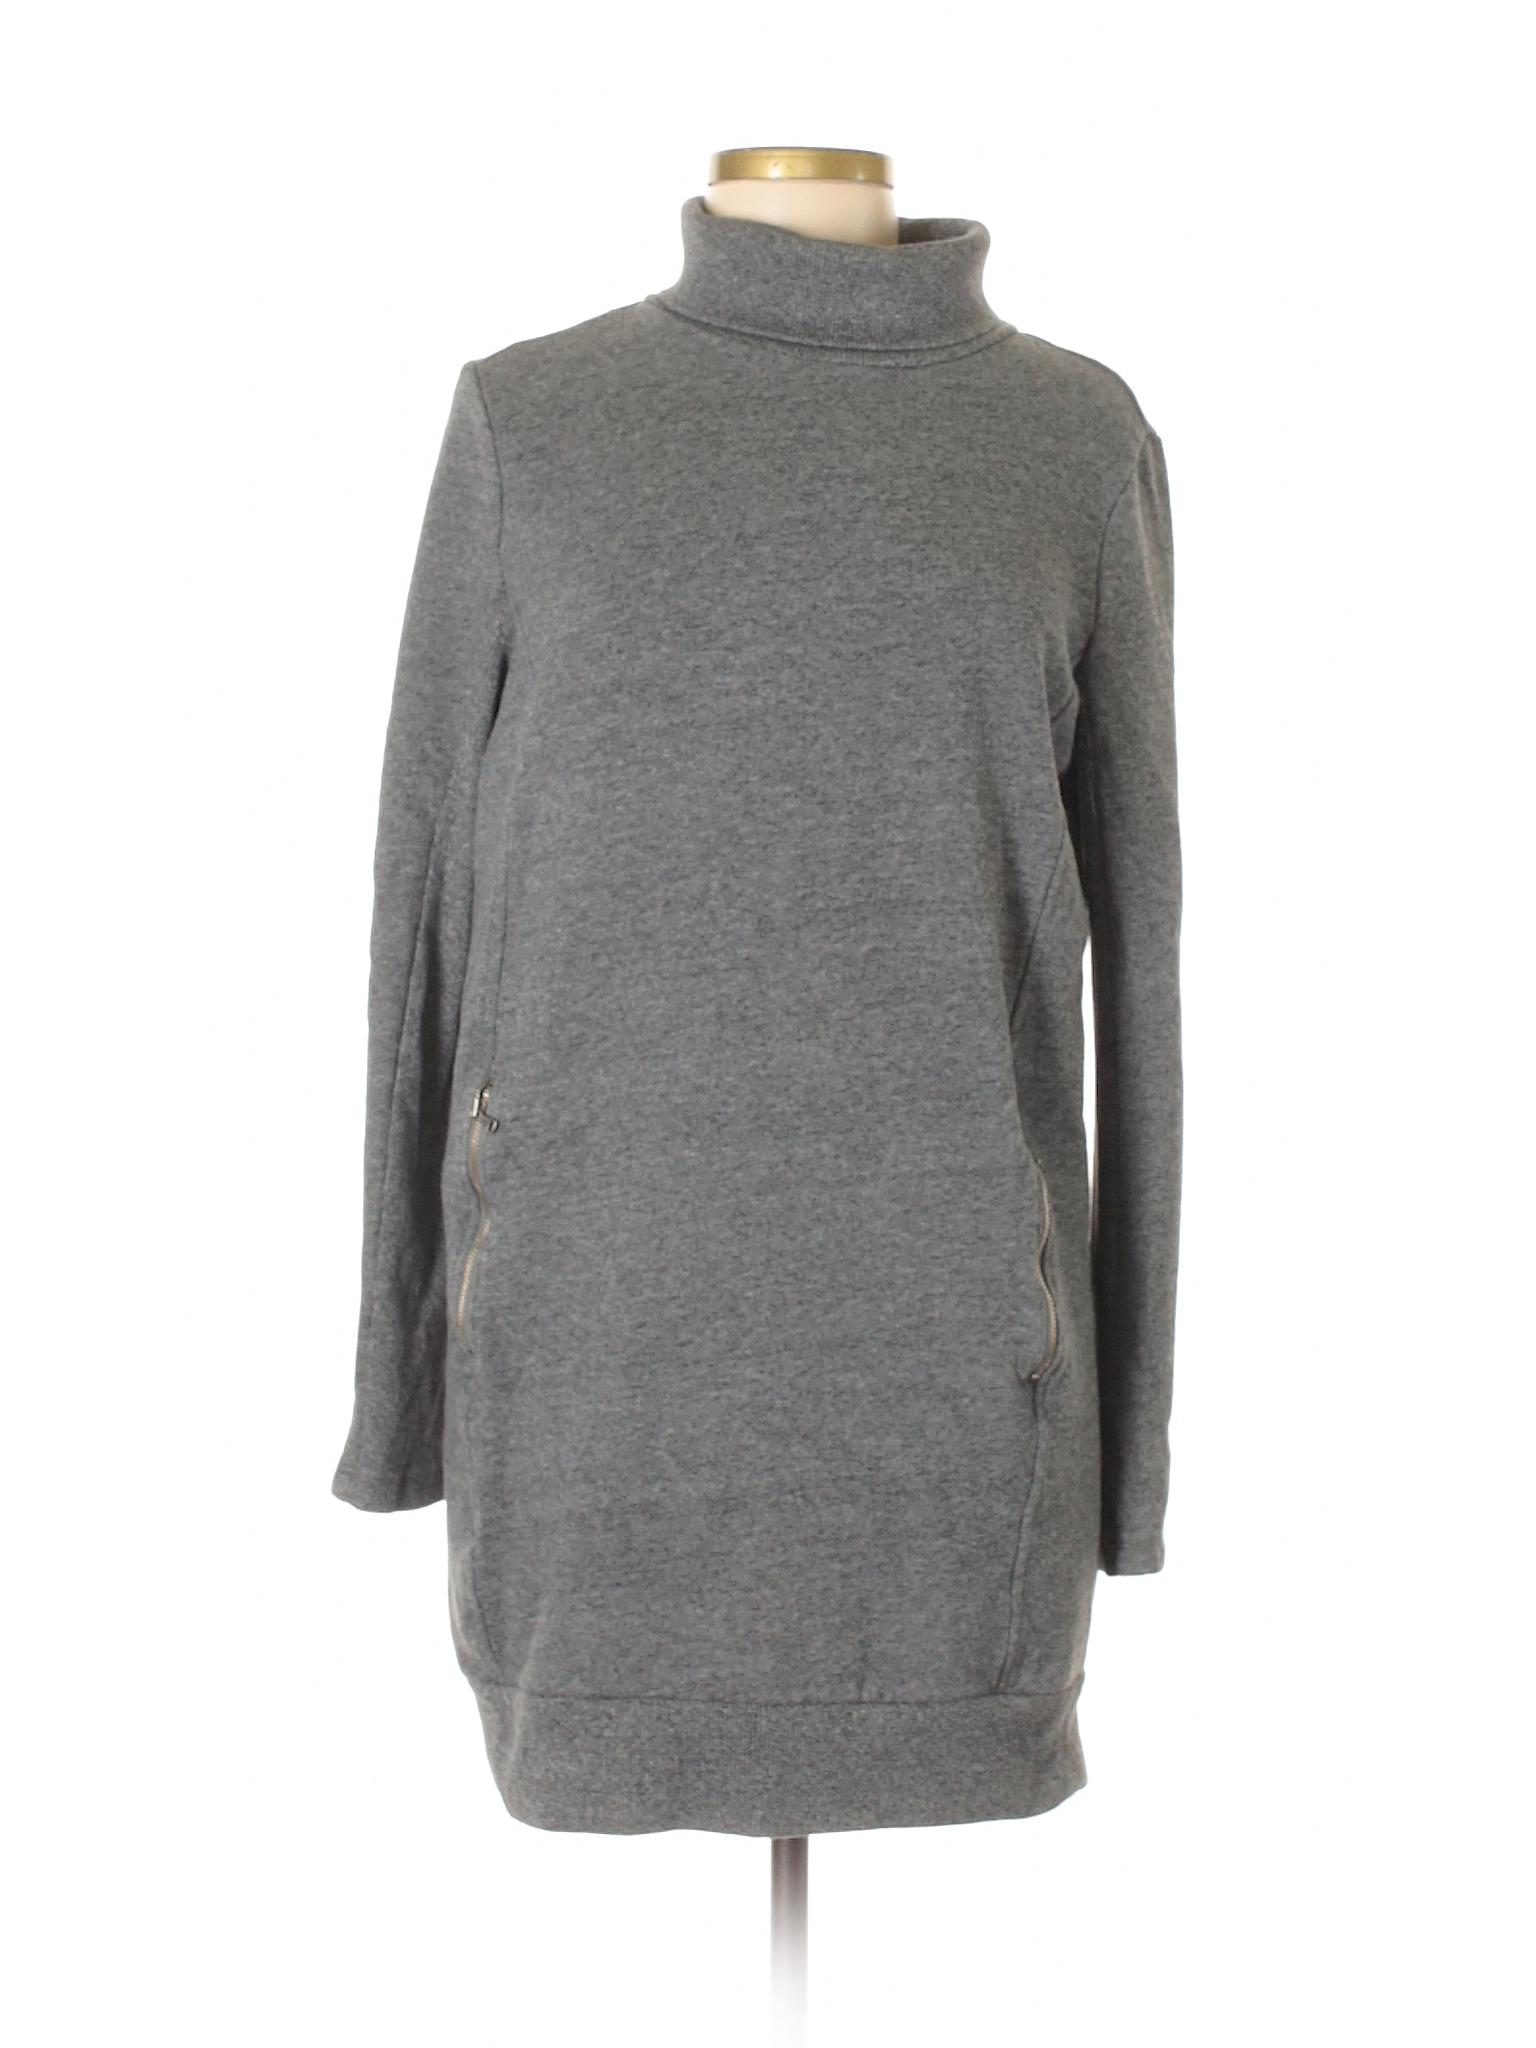 Dress Grey winter Boutique Casual amp; Lou 7qXWAa8